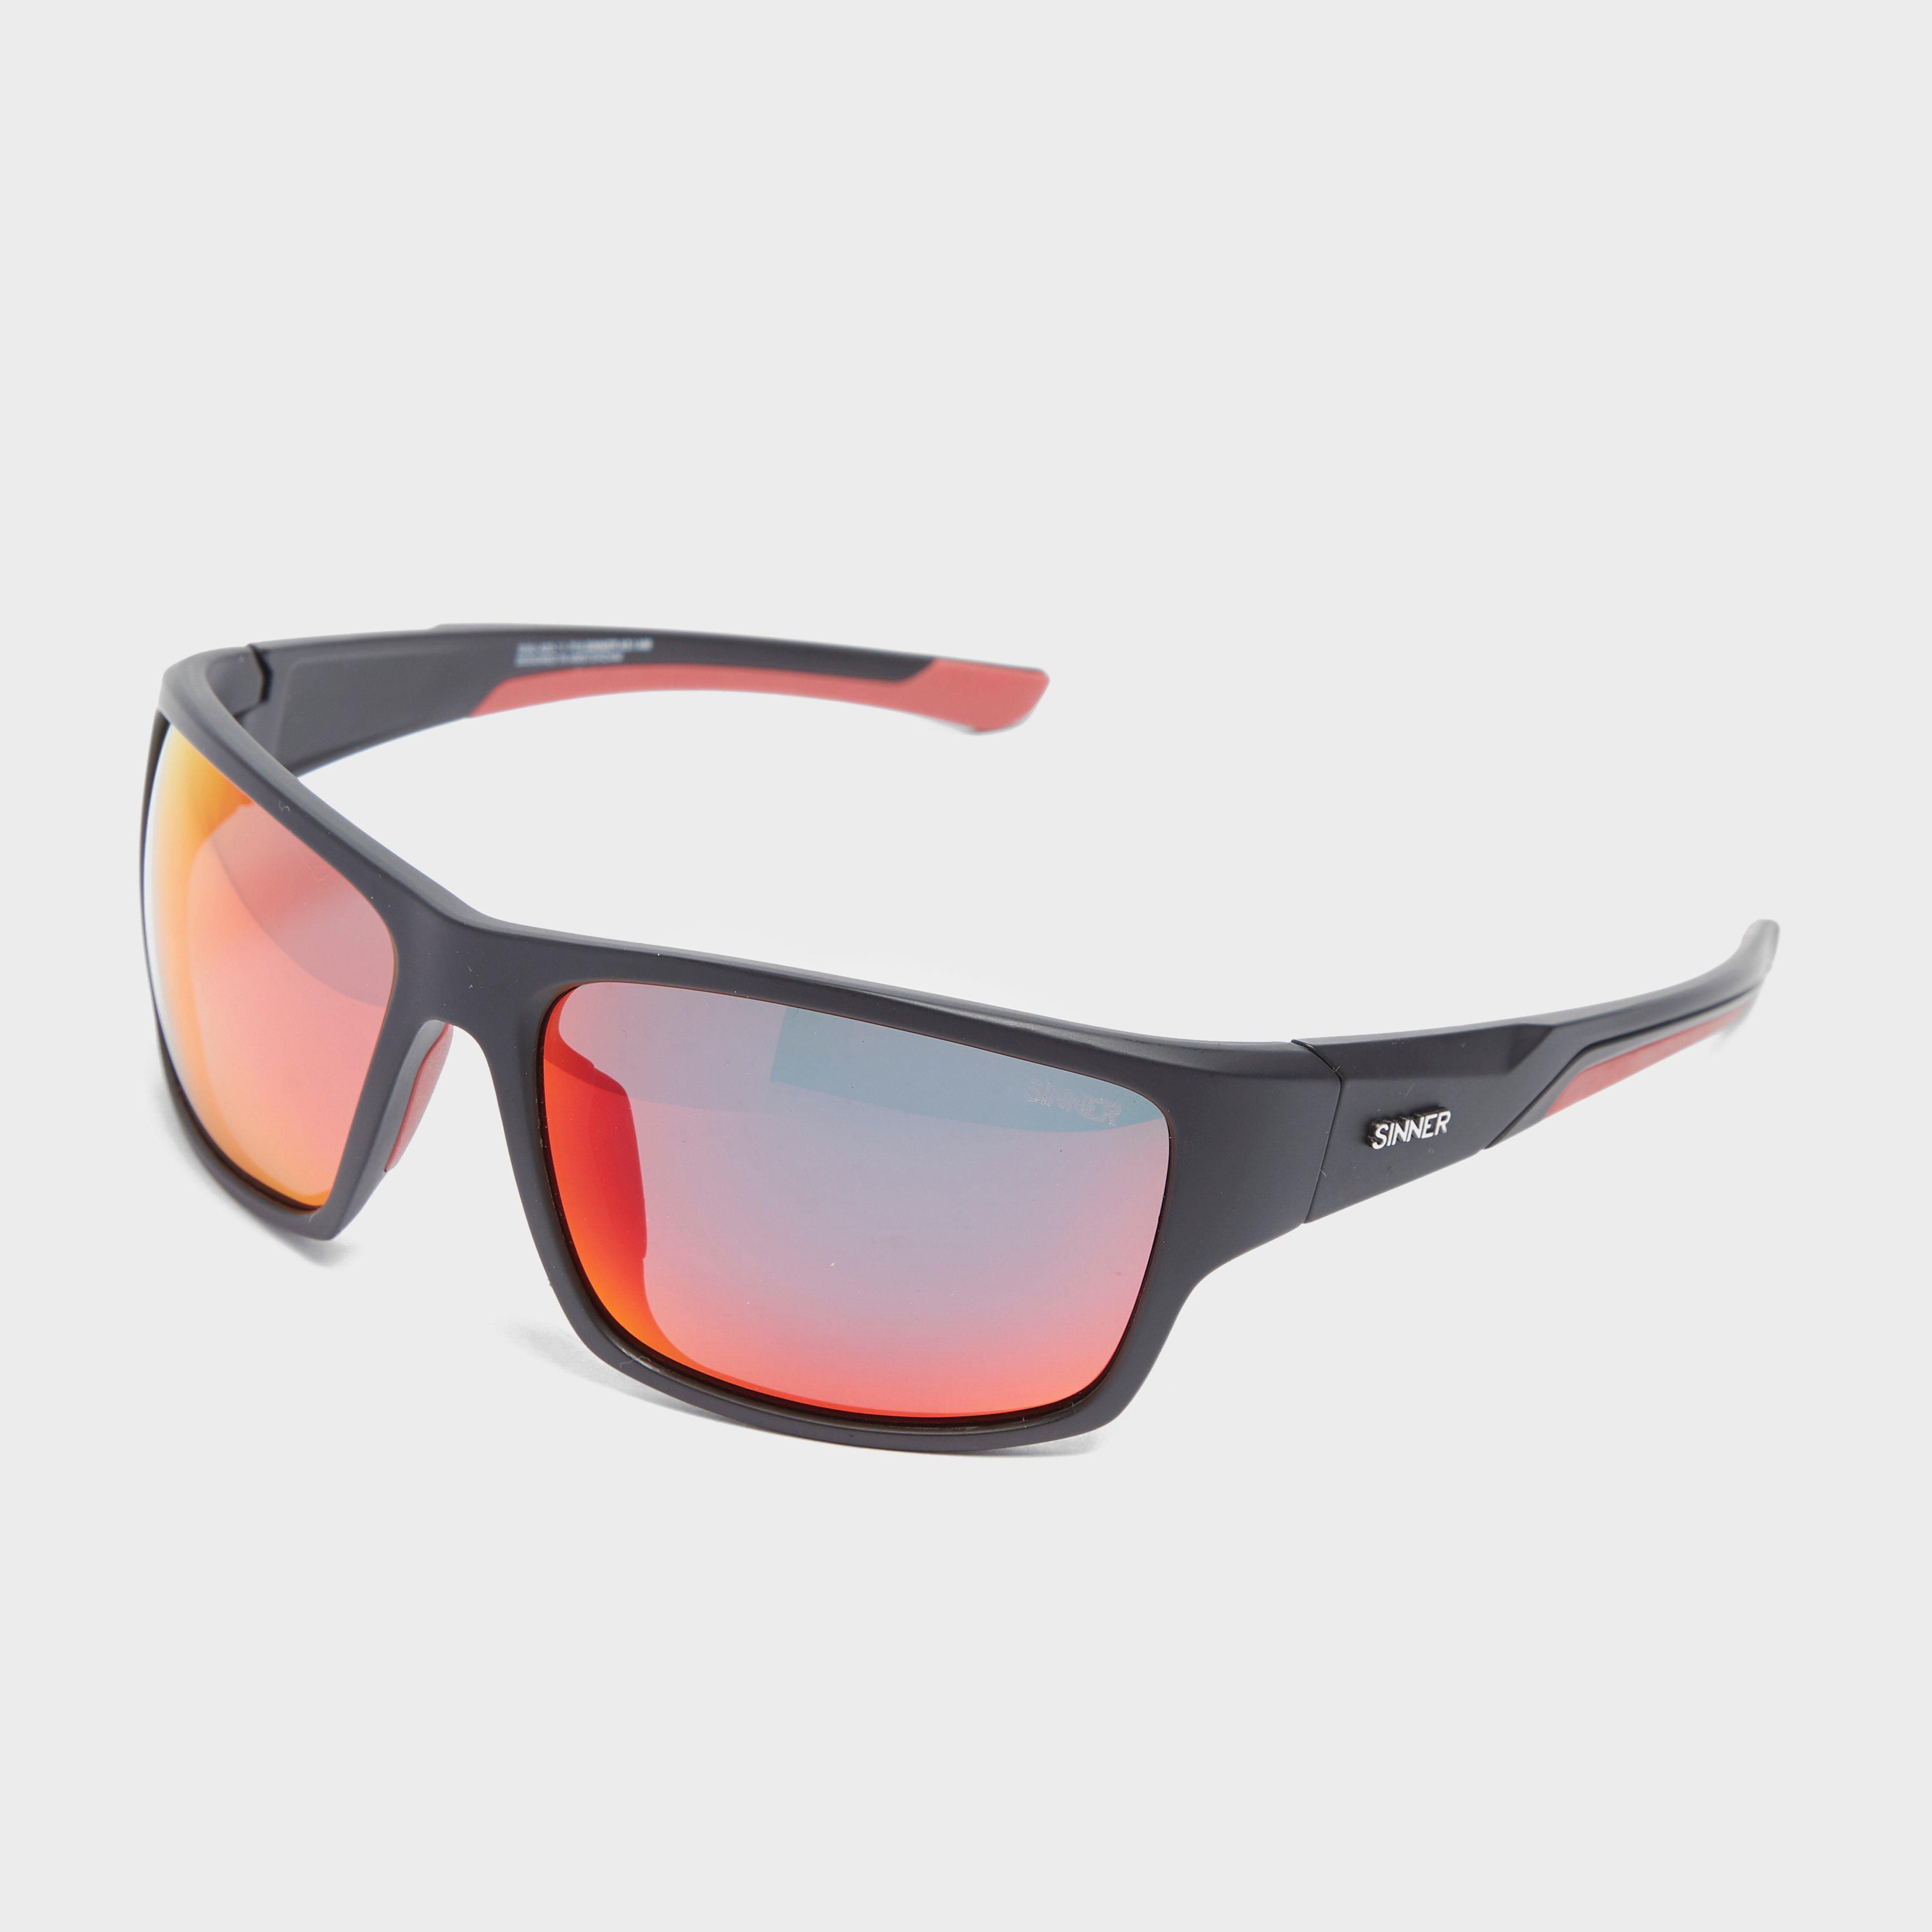 Sinner Sinner Lemmon SINTEC Sunglasses, Red